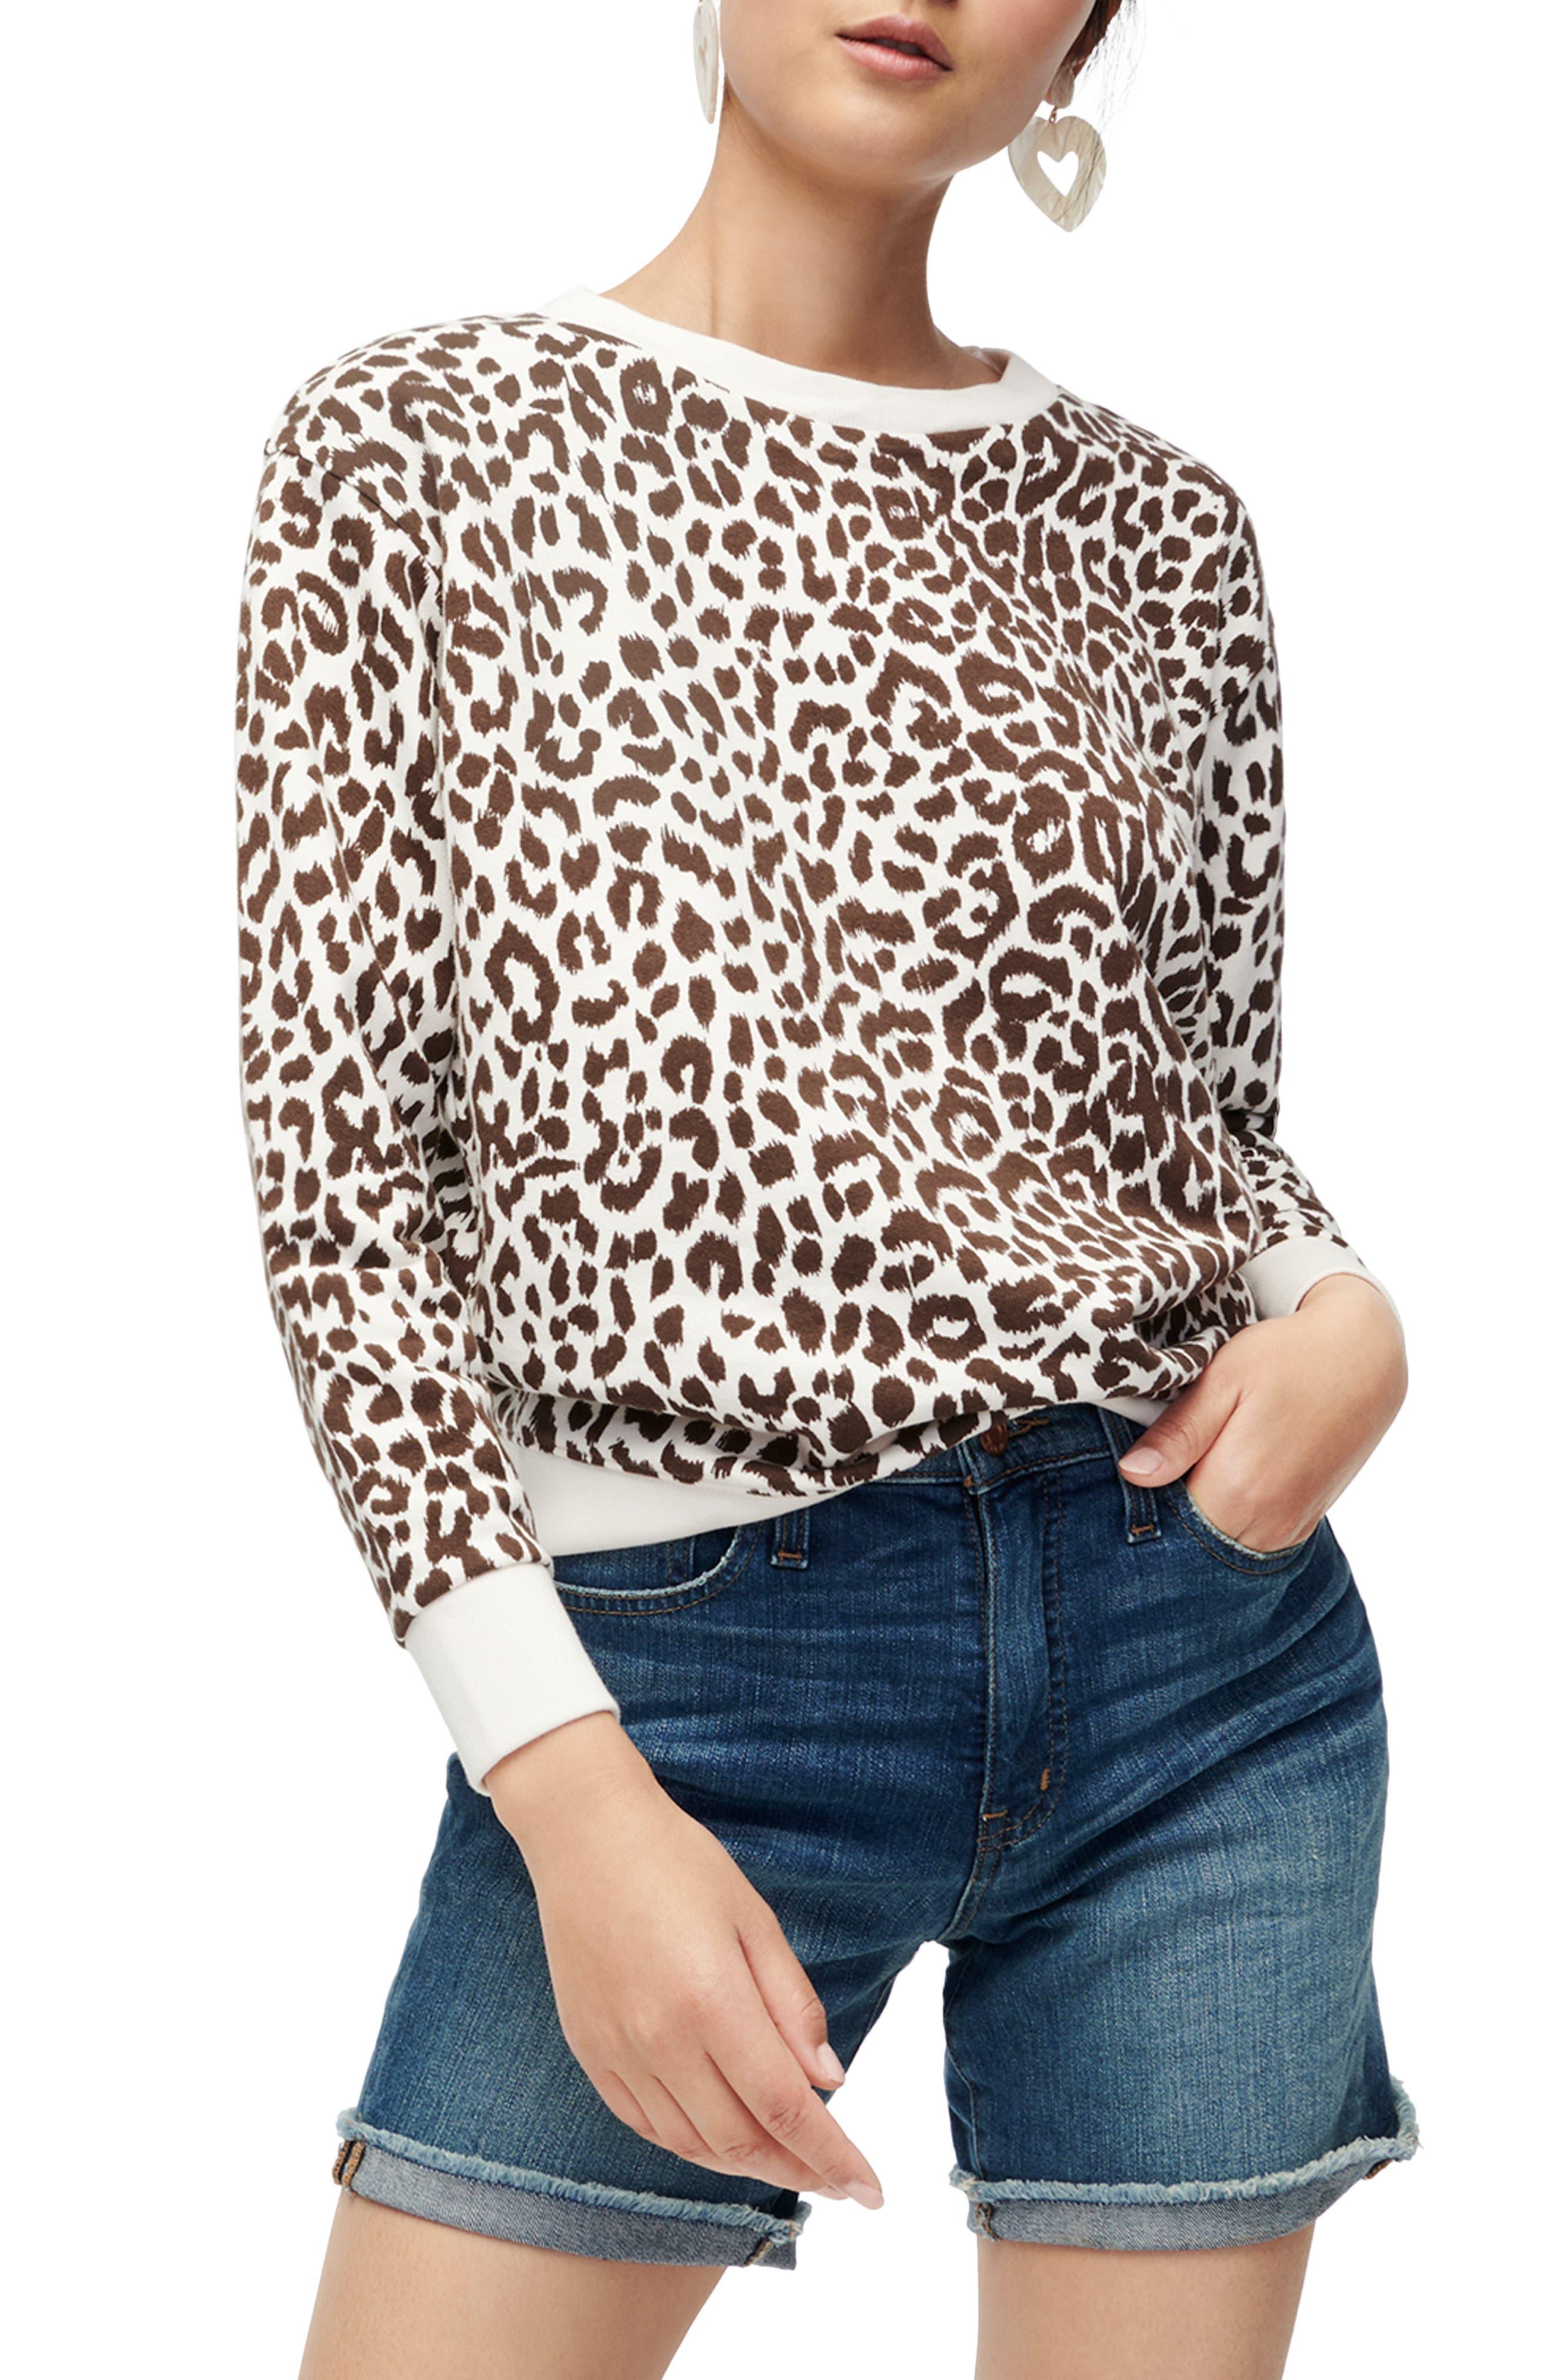 J.Crew Leopard Cotton Crewneck Sweatshirt